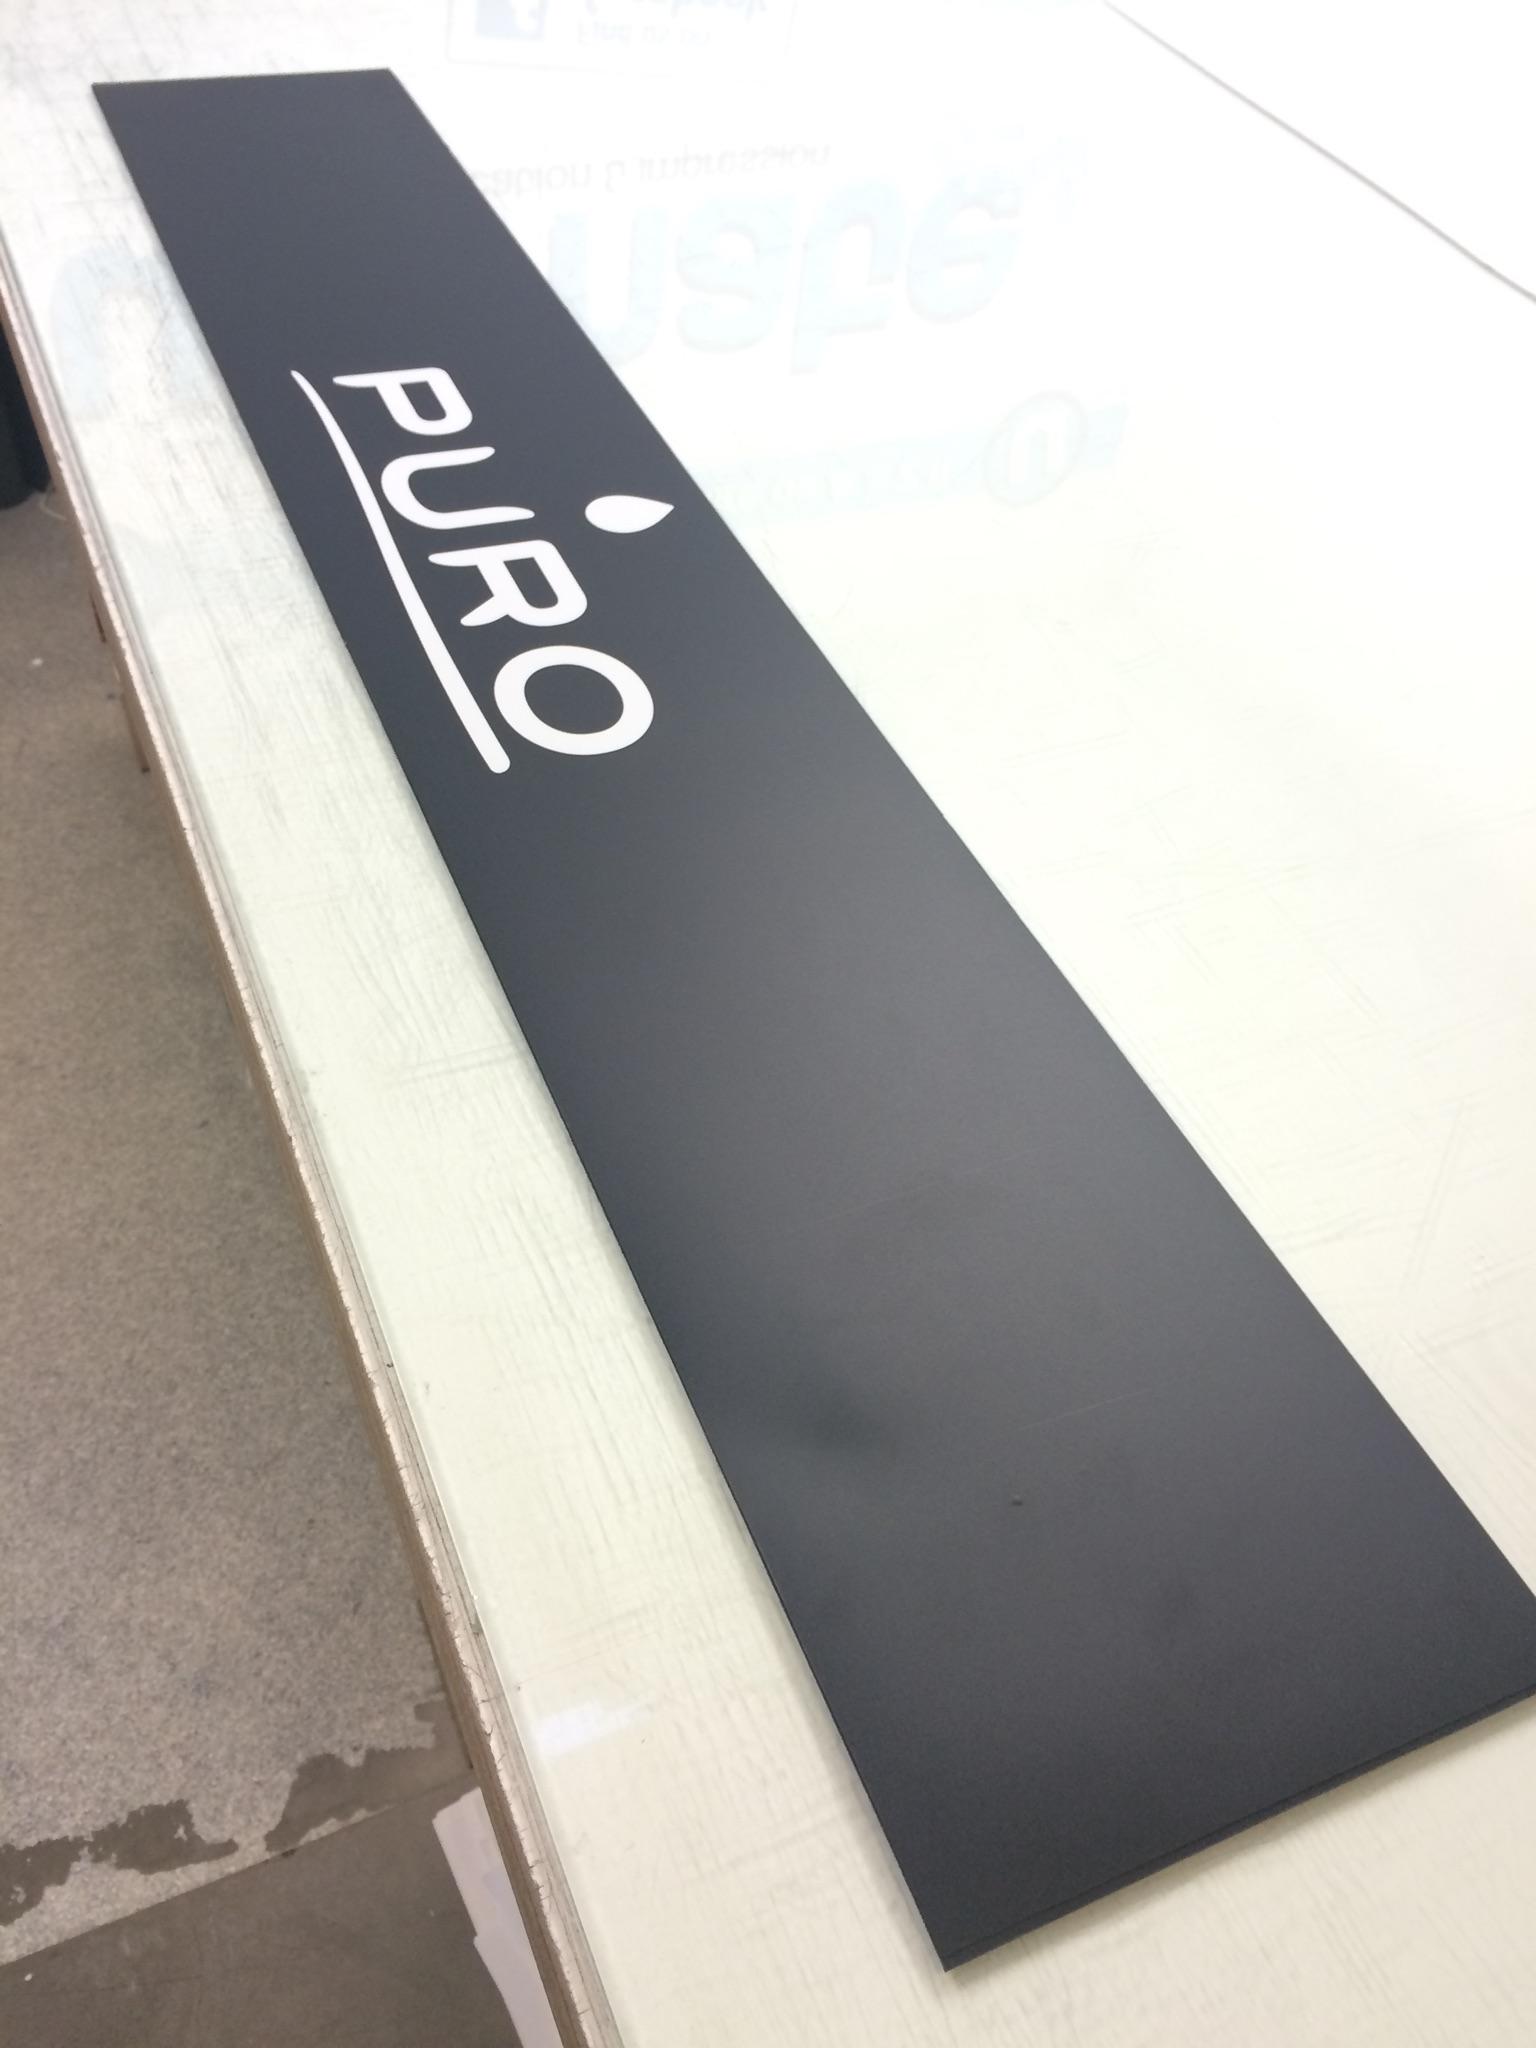 panneau magn tique puro flyers stickers lettrages impression. Black Bedroom Furniture Sets. Home Design Ideas